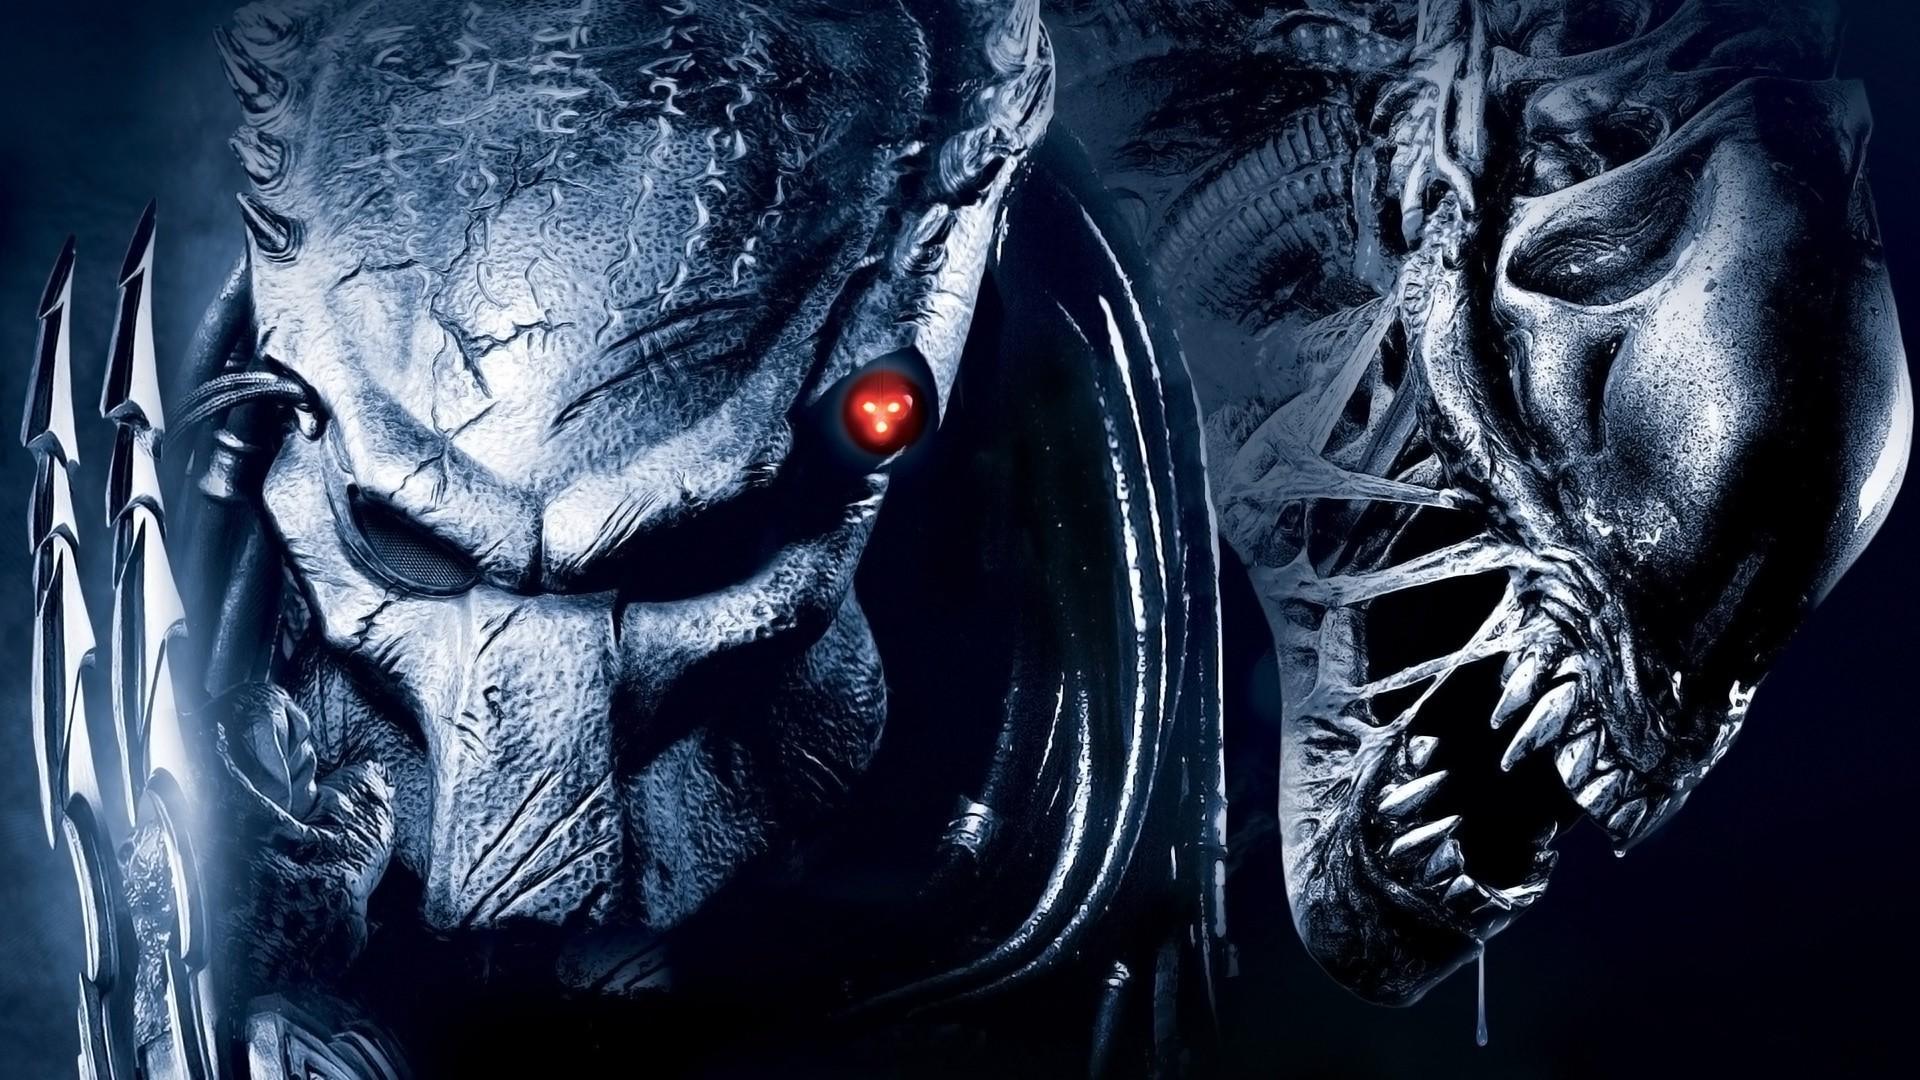 Alien Vs Predator Hd Wallpapers: Predator Wallpapers Backgrounds (74+ Images